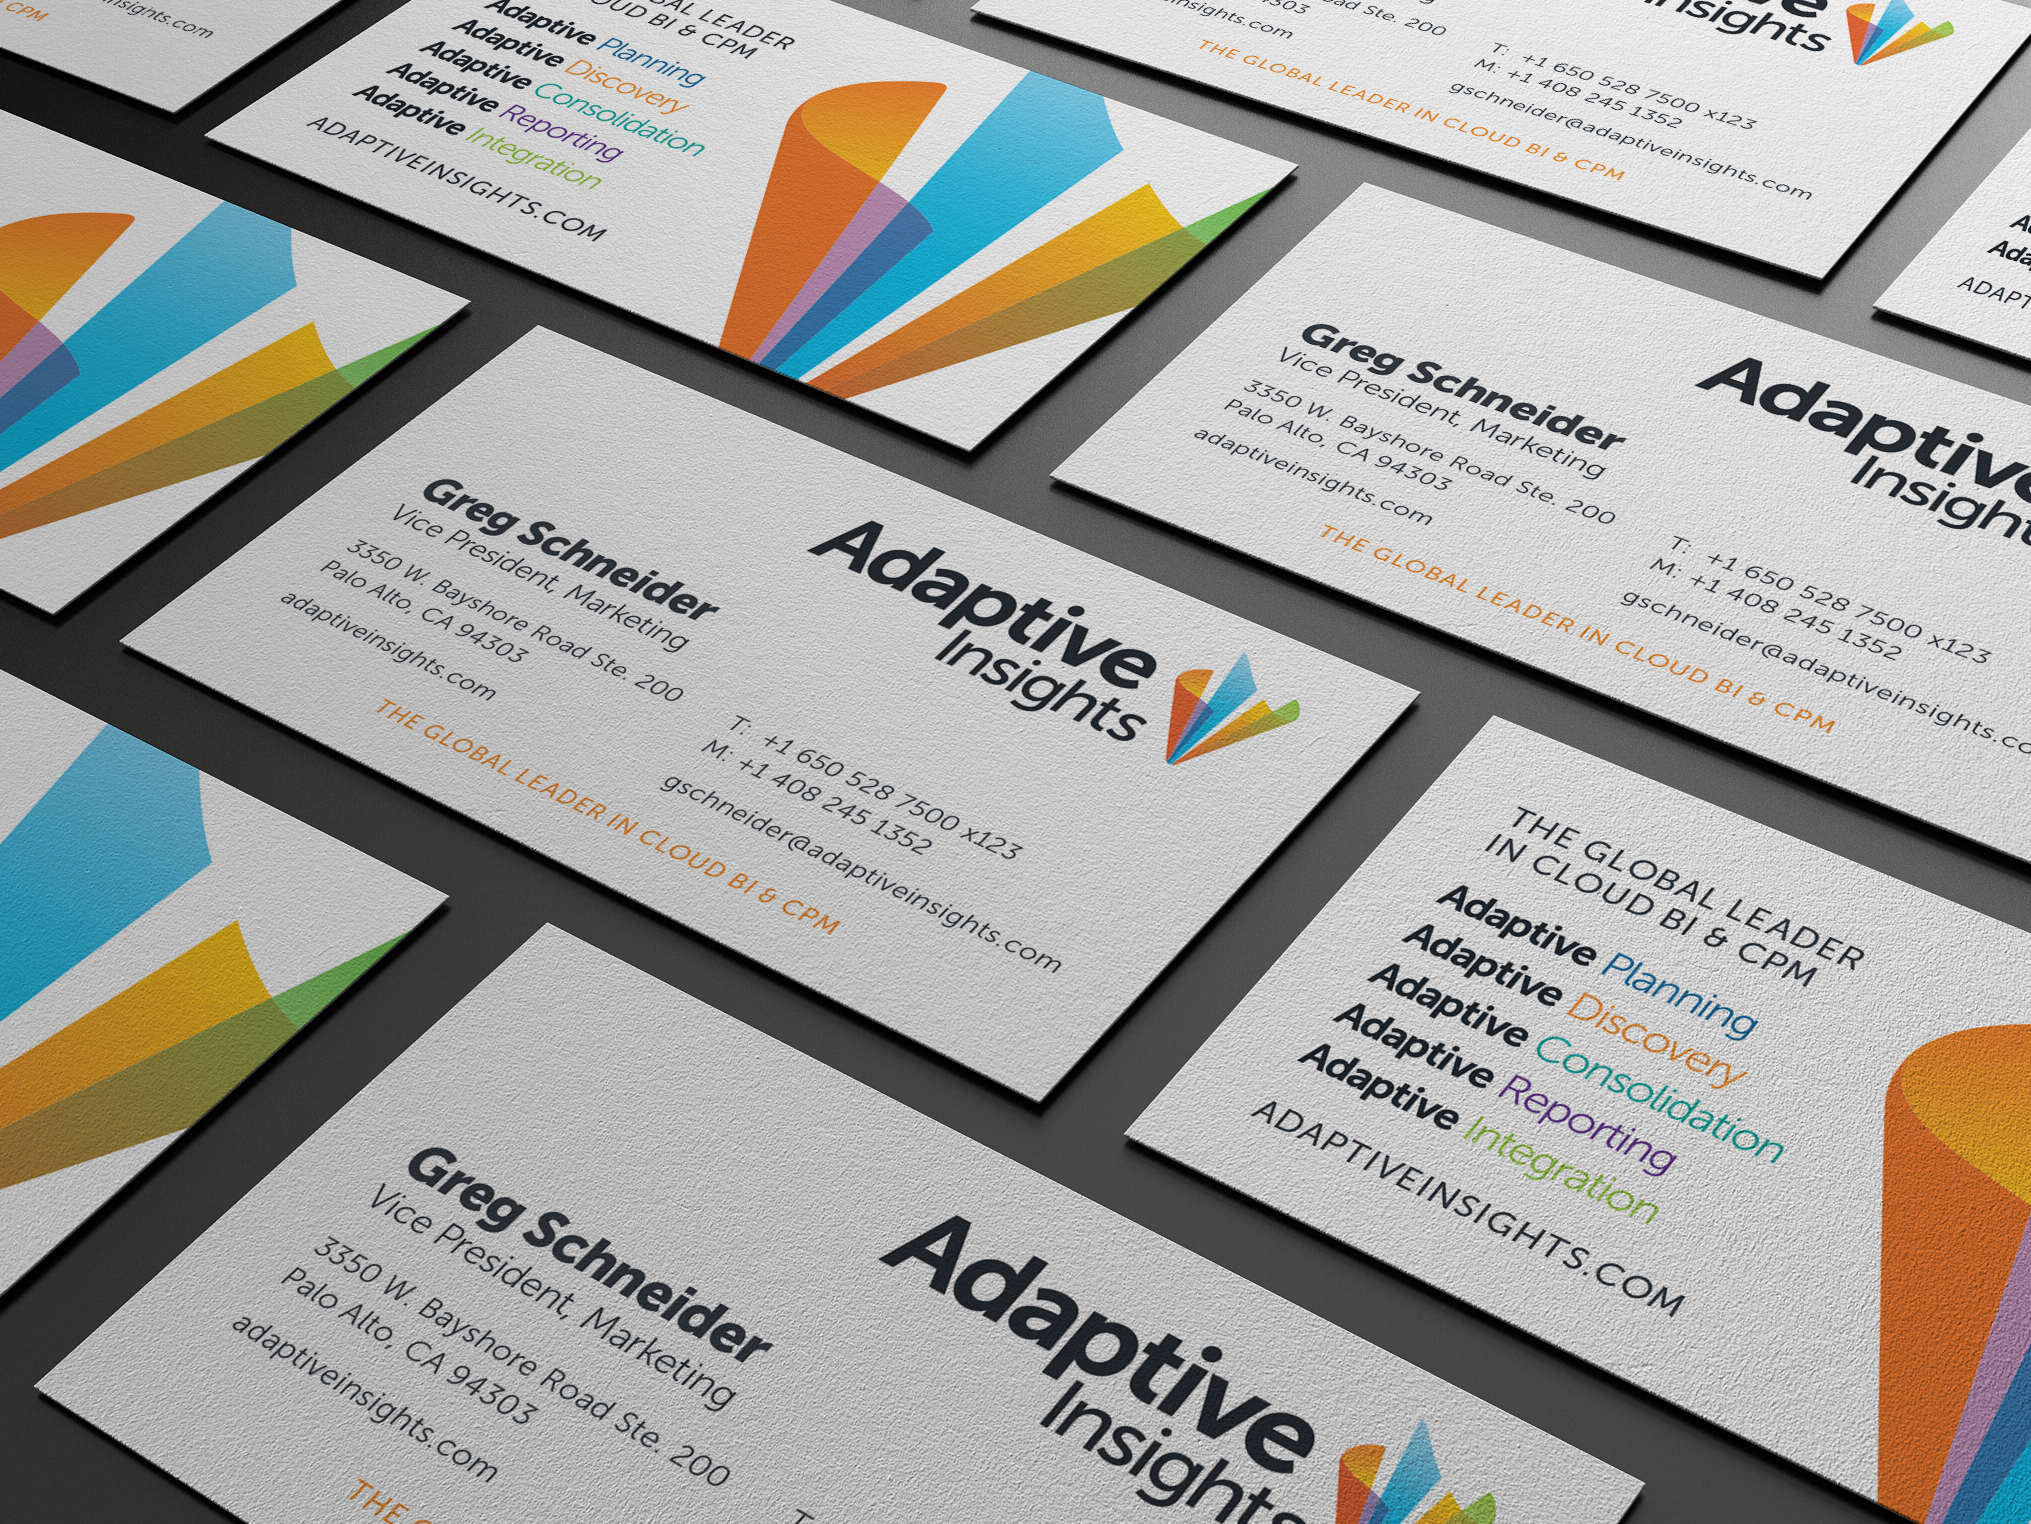 ADAP_businesscard_mockup_1.jpg